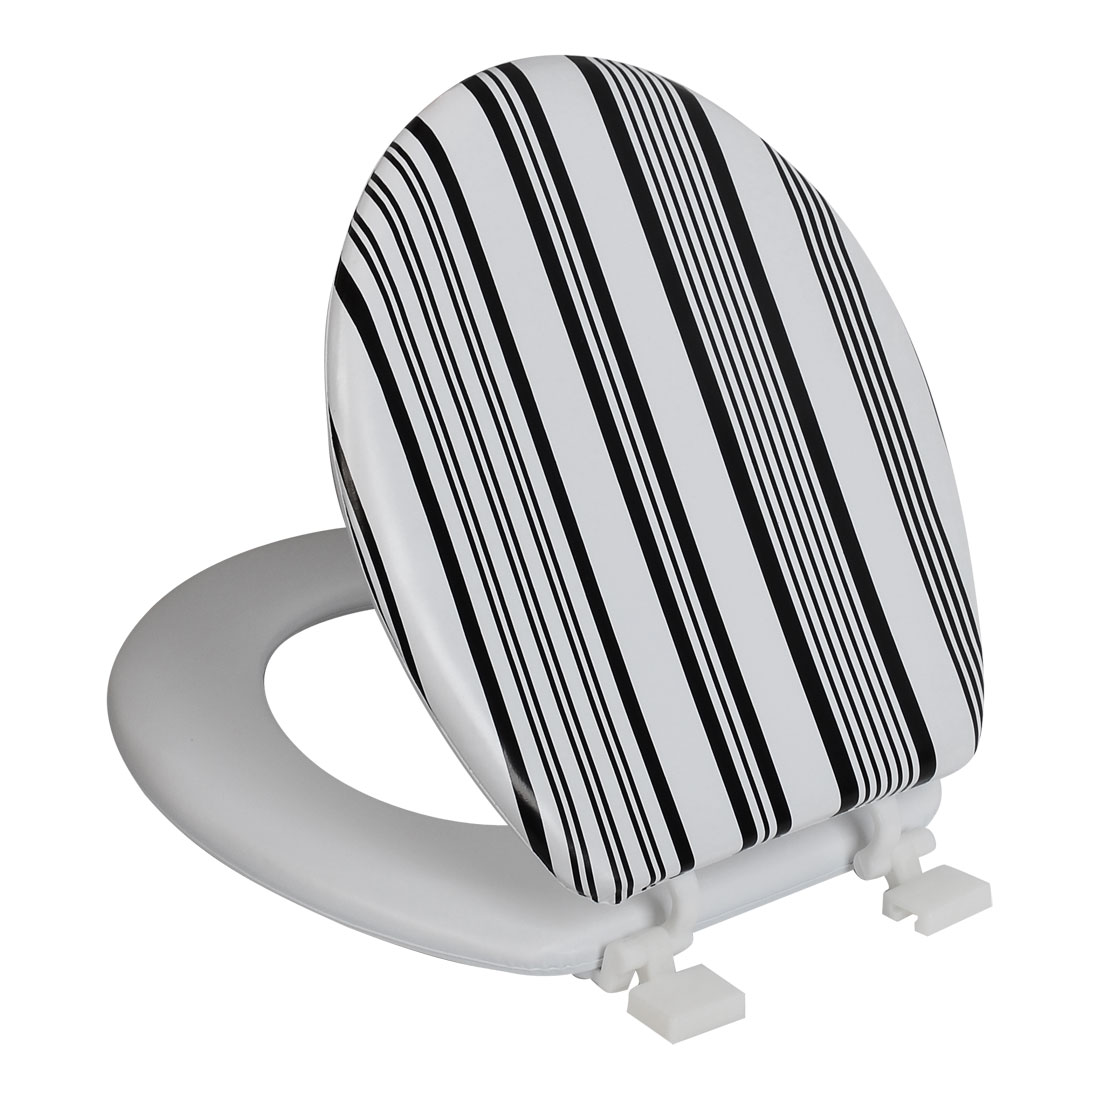 Bathroom Faux Leather Stripe Pattern Soft Toilet Seat